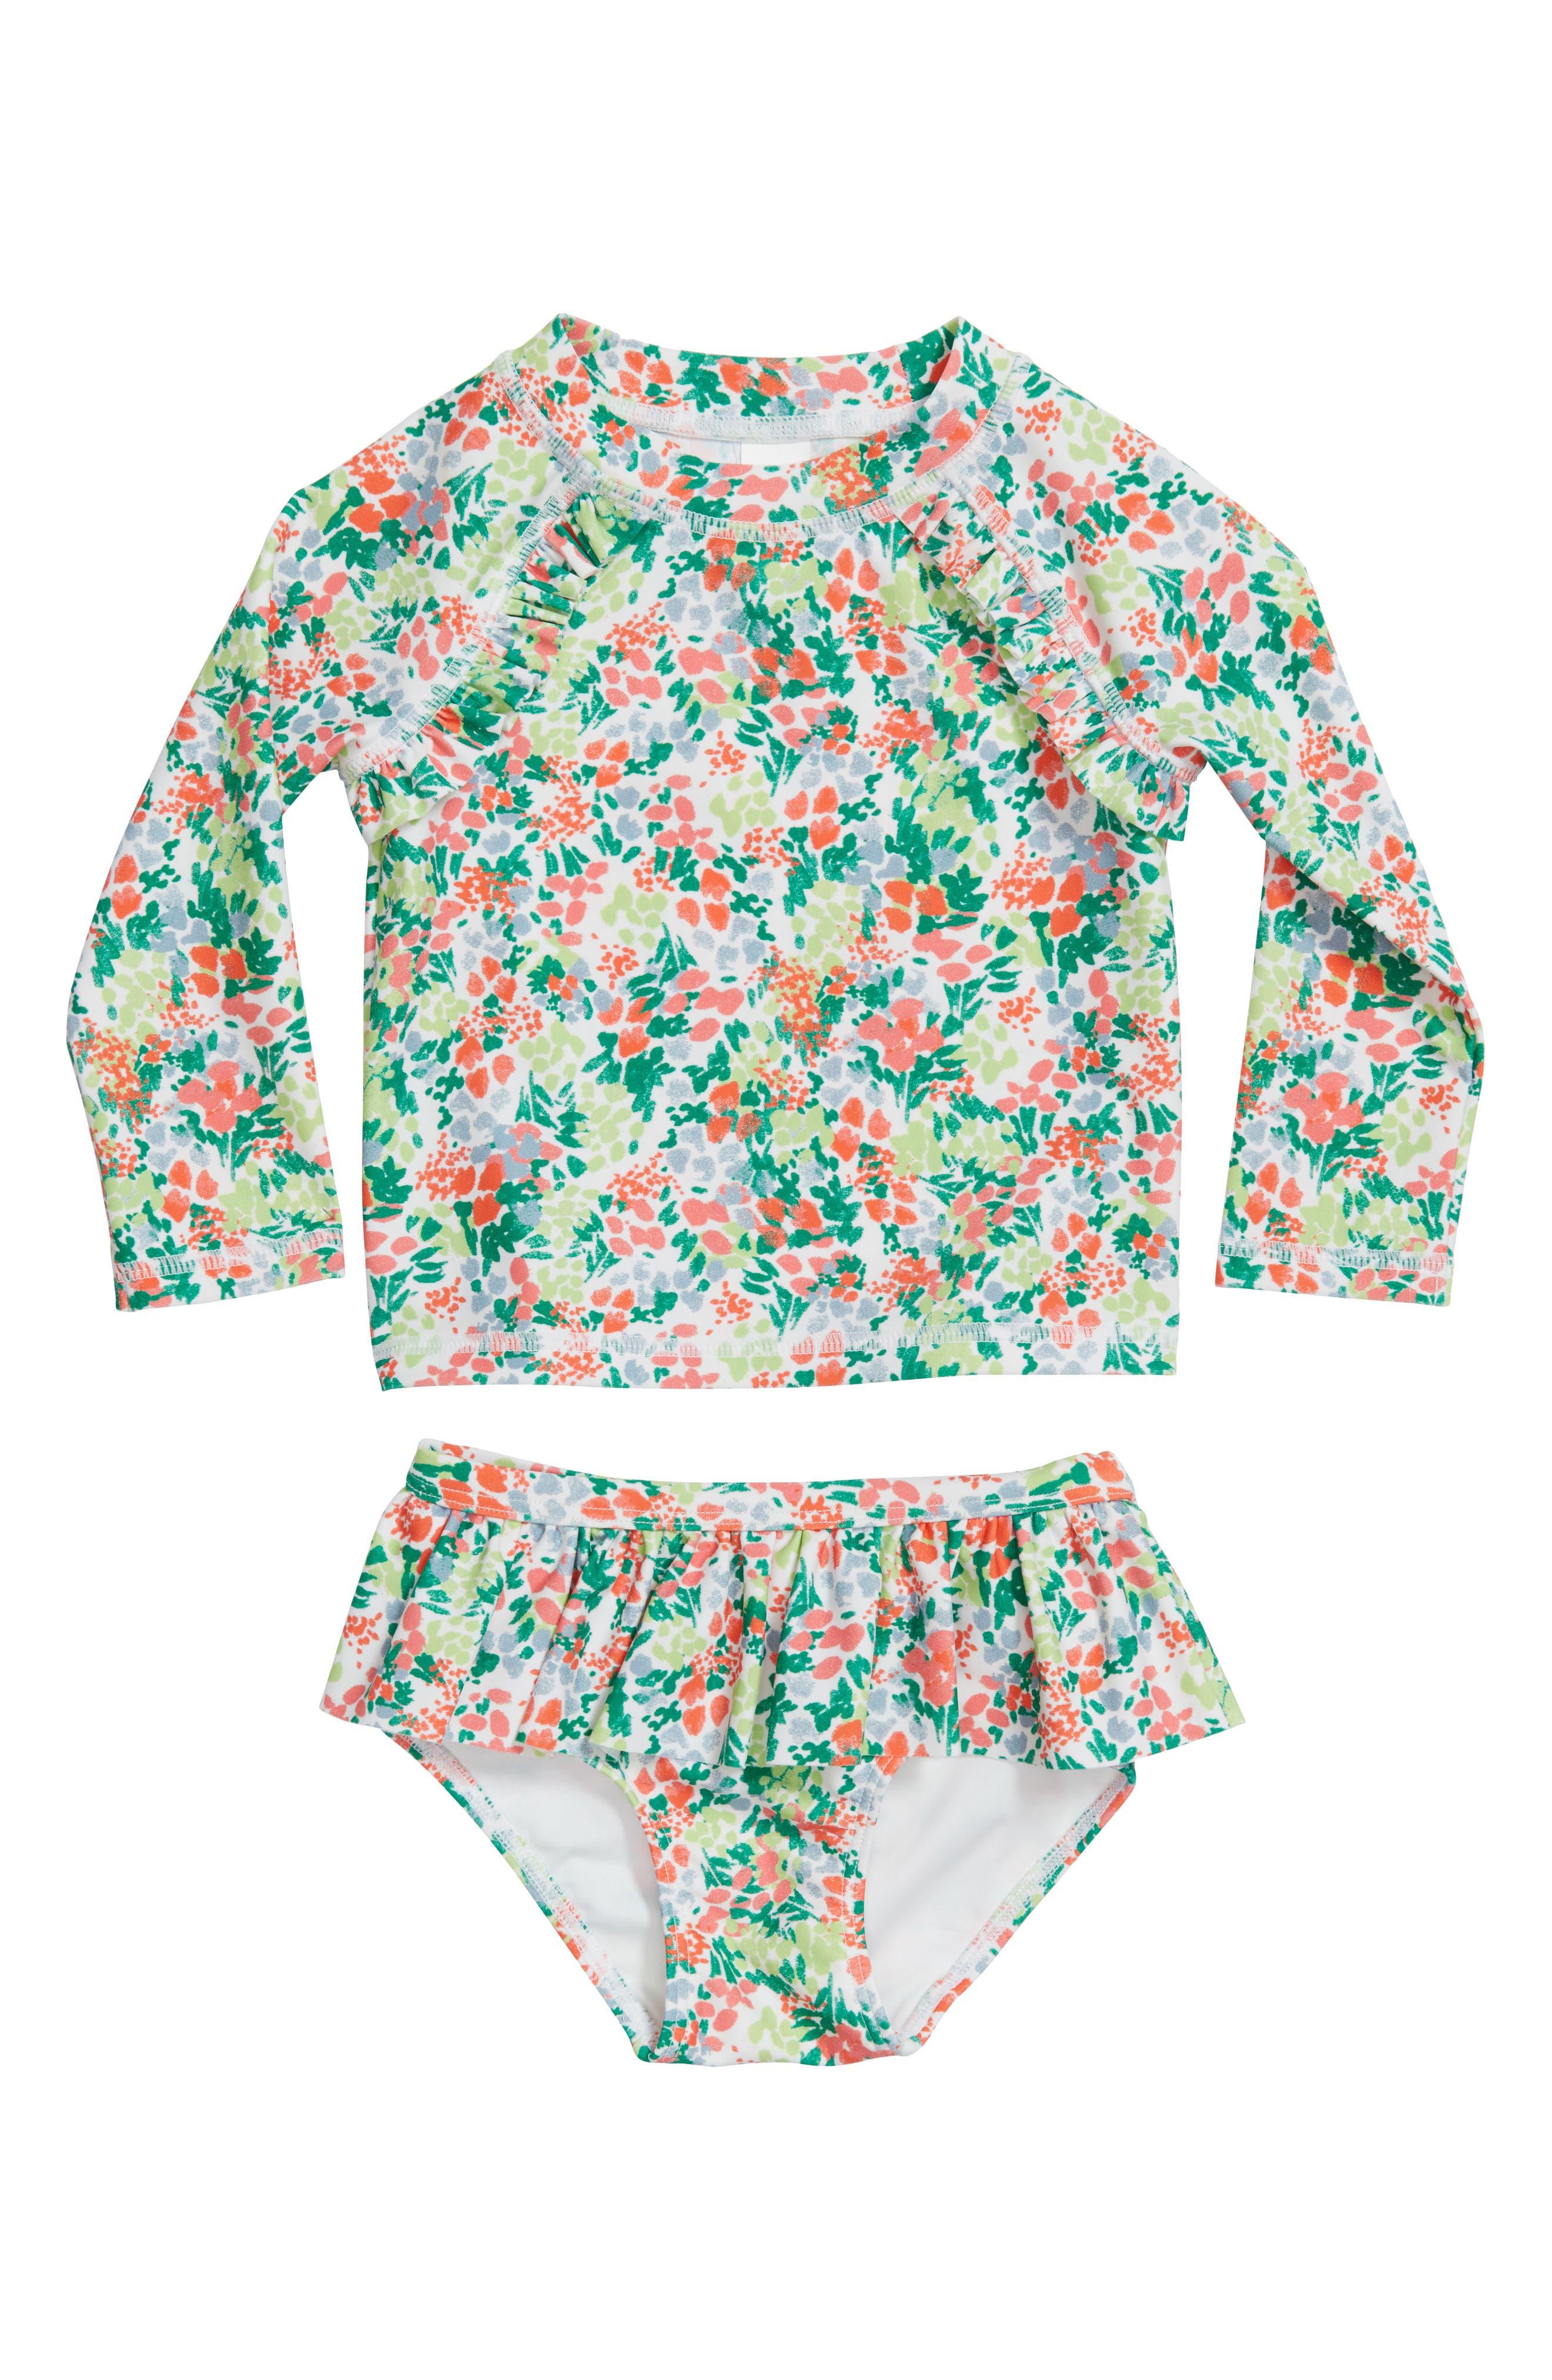 Two-Piece Rashguard Swimsuit,                             Main thumbnail 1, color,                             White Multi Meadow